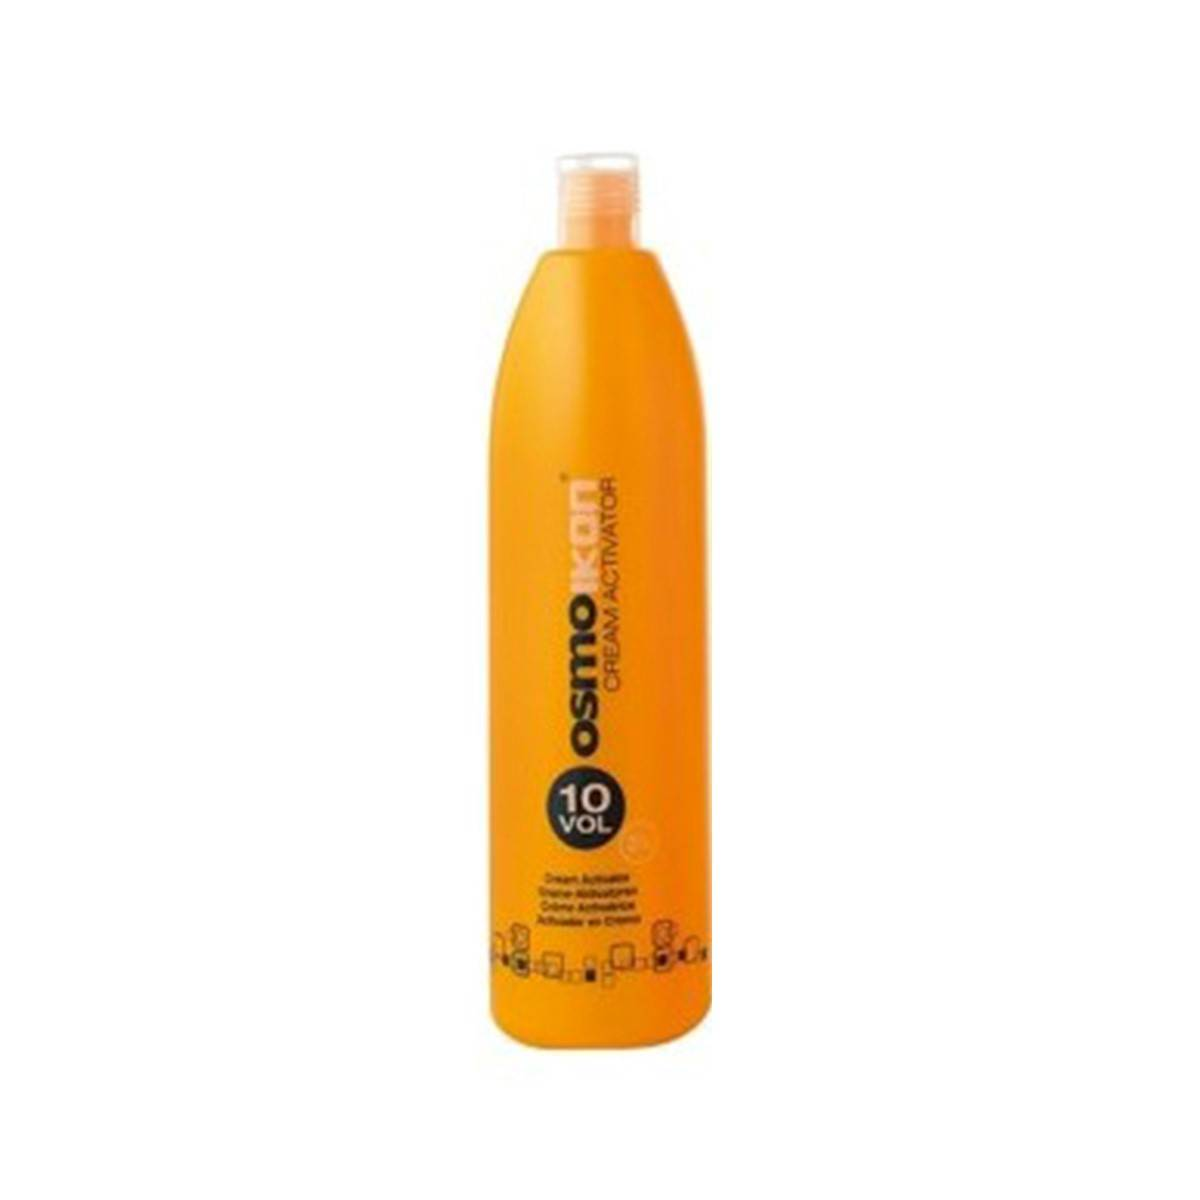 Osmo Ikon Cream Coact. 10 Vol Ossigeno 10 Vol